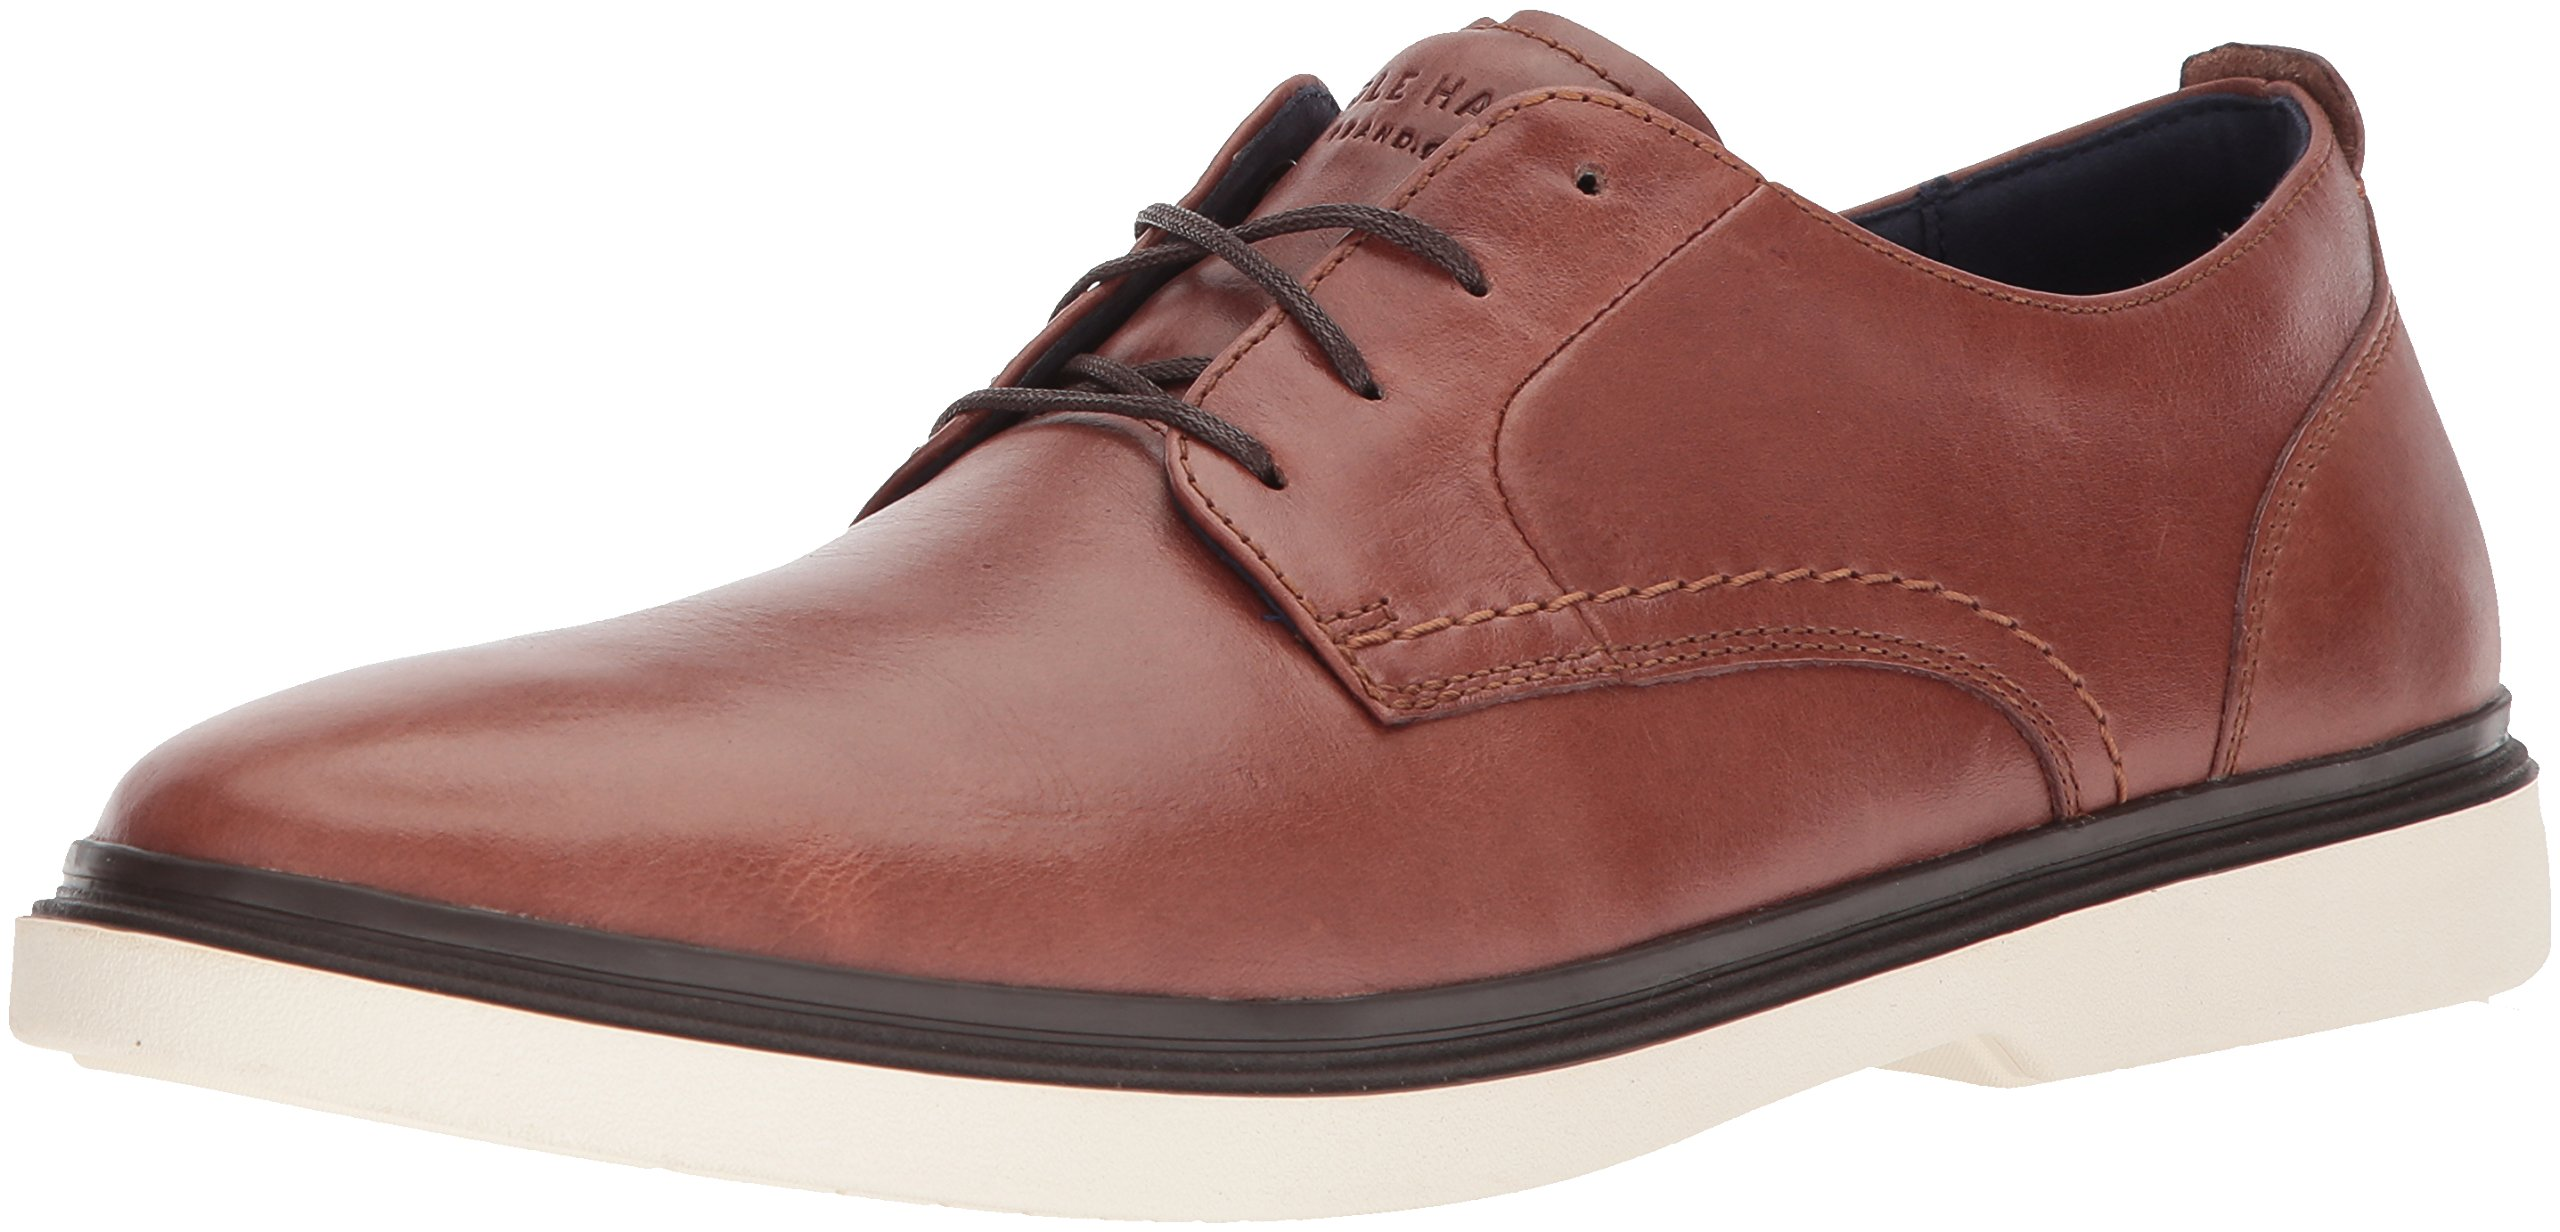 Cole Haan Men's Brandt Plain Toe Oxford, Woodbury/Ivory, 10.5 Medium US